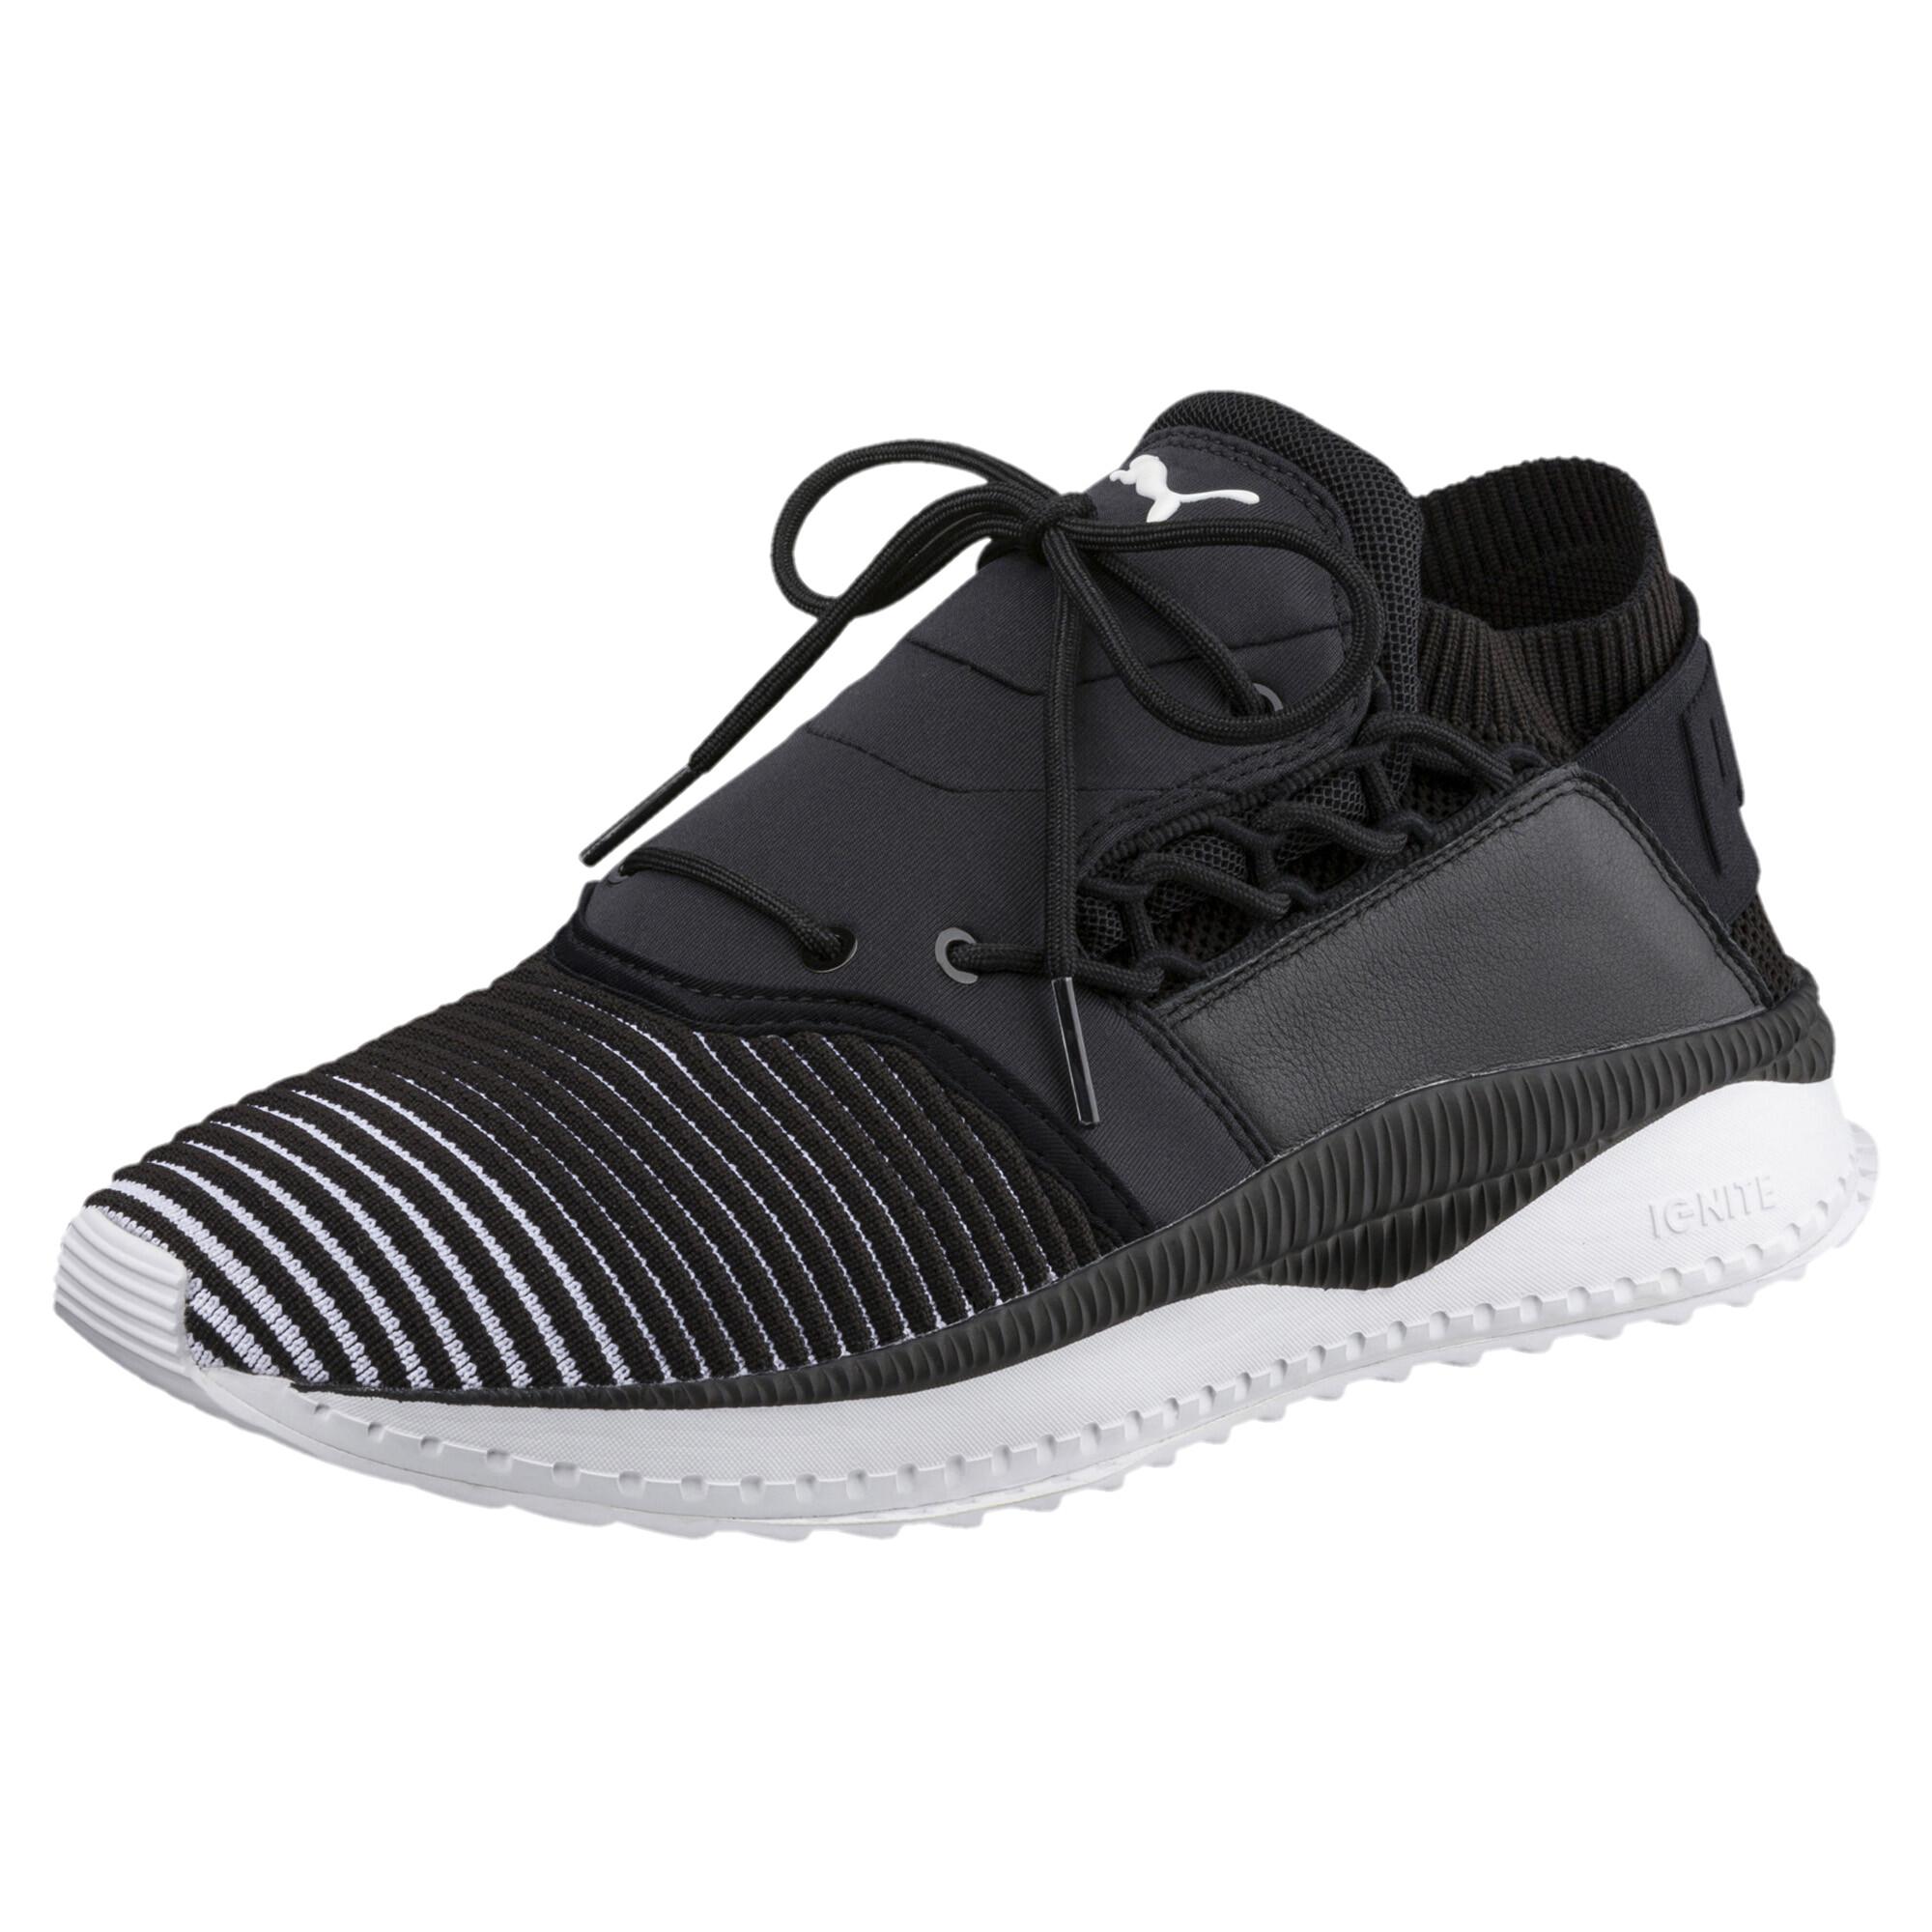 on sale 4d426 34bde Image Puma Men s TSUGI Shinsei evoKNIT Sneakers  1